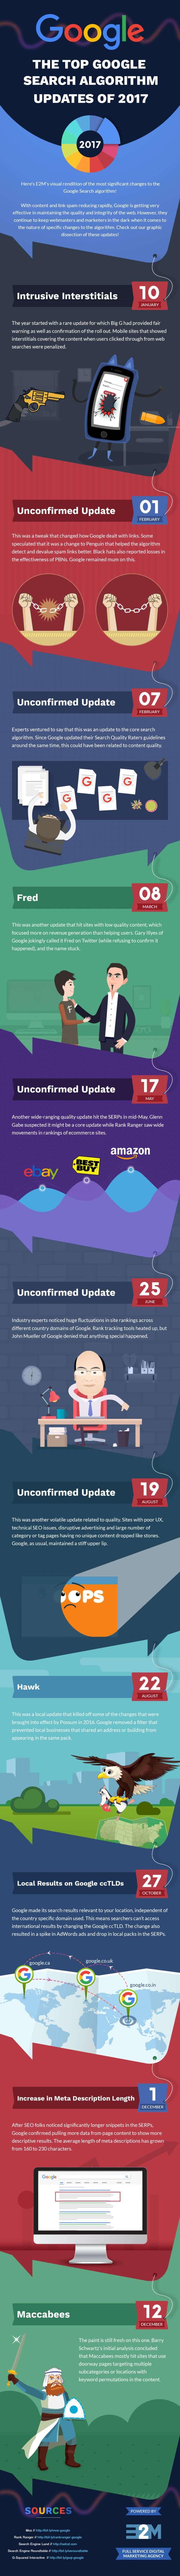 2017 Google Algorithm Updates Infographic